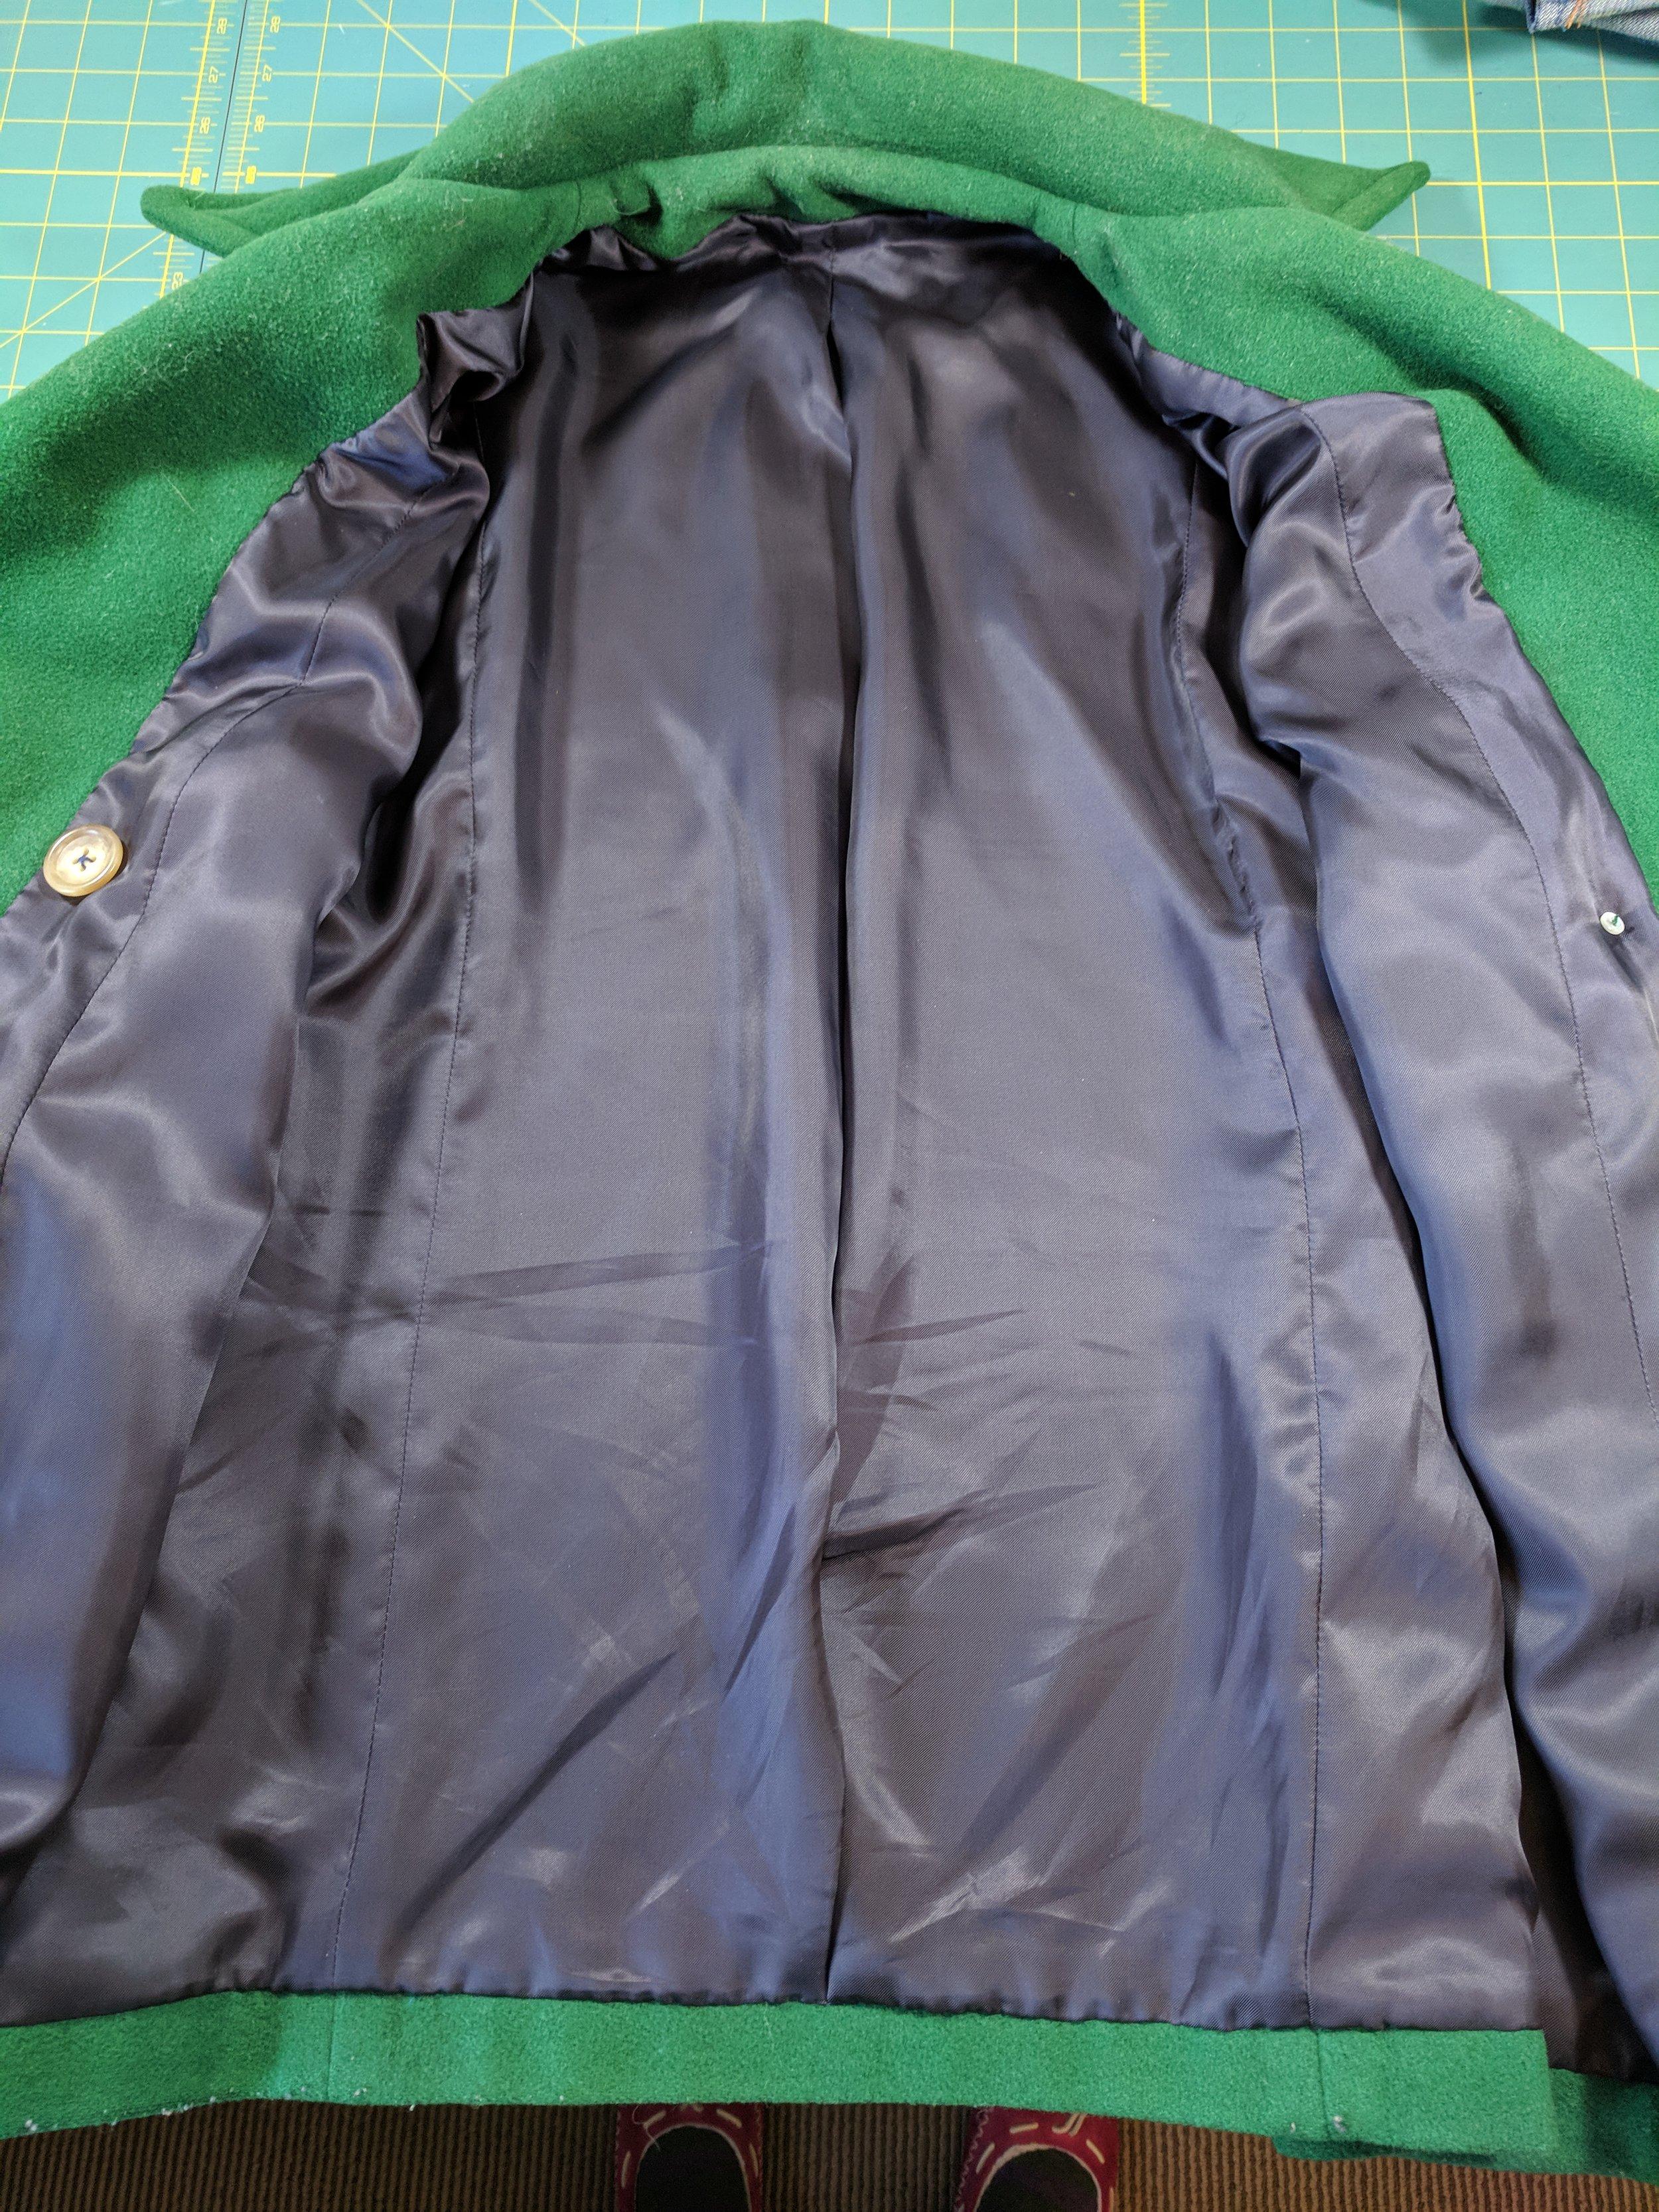 coat lining remake